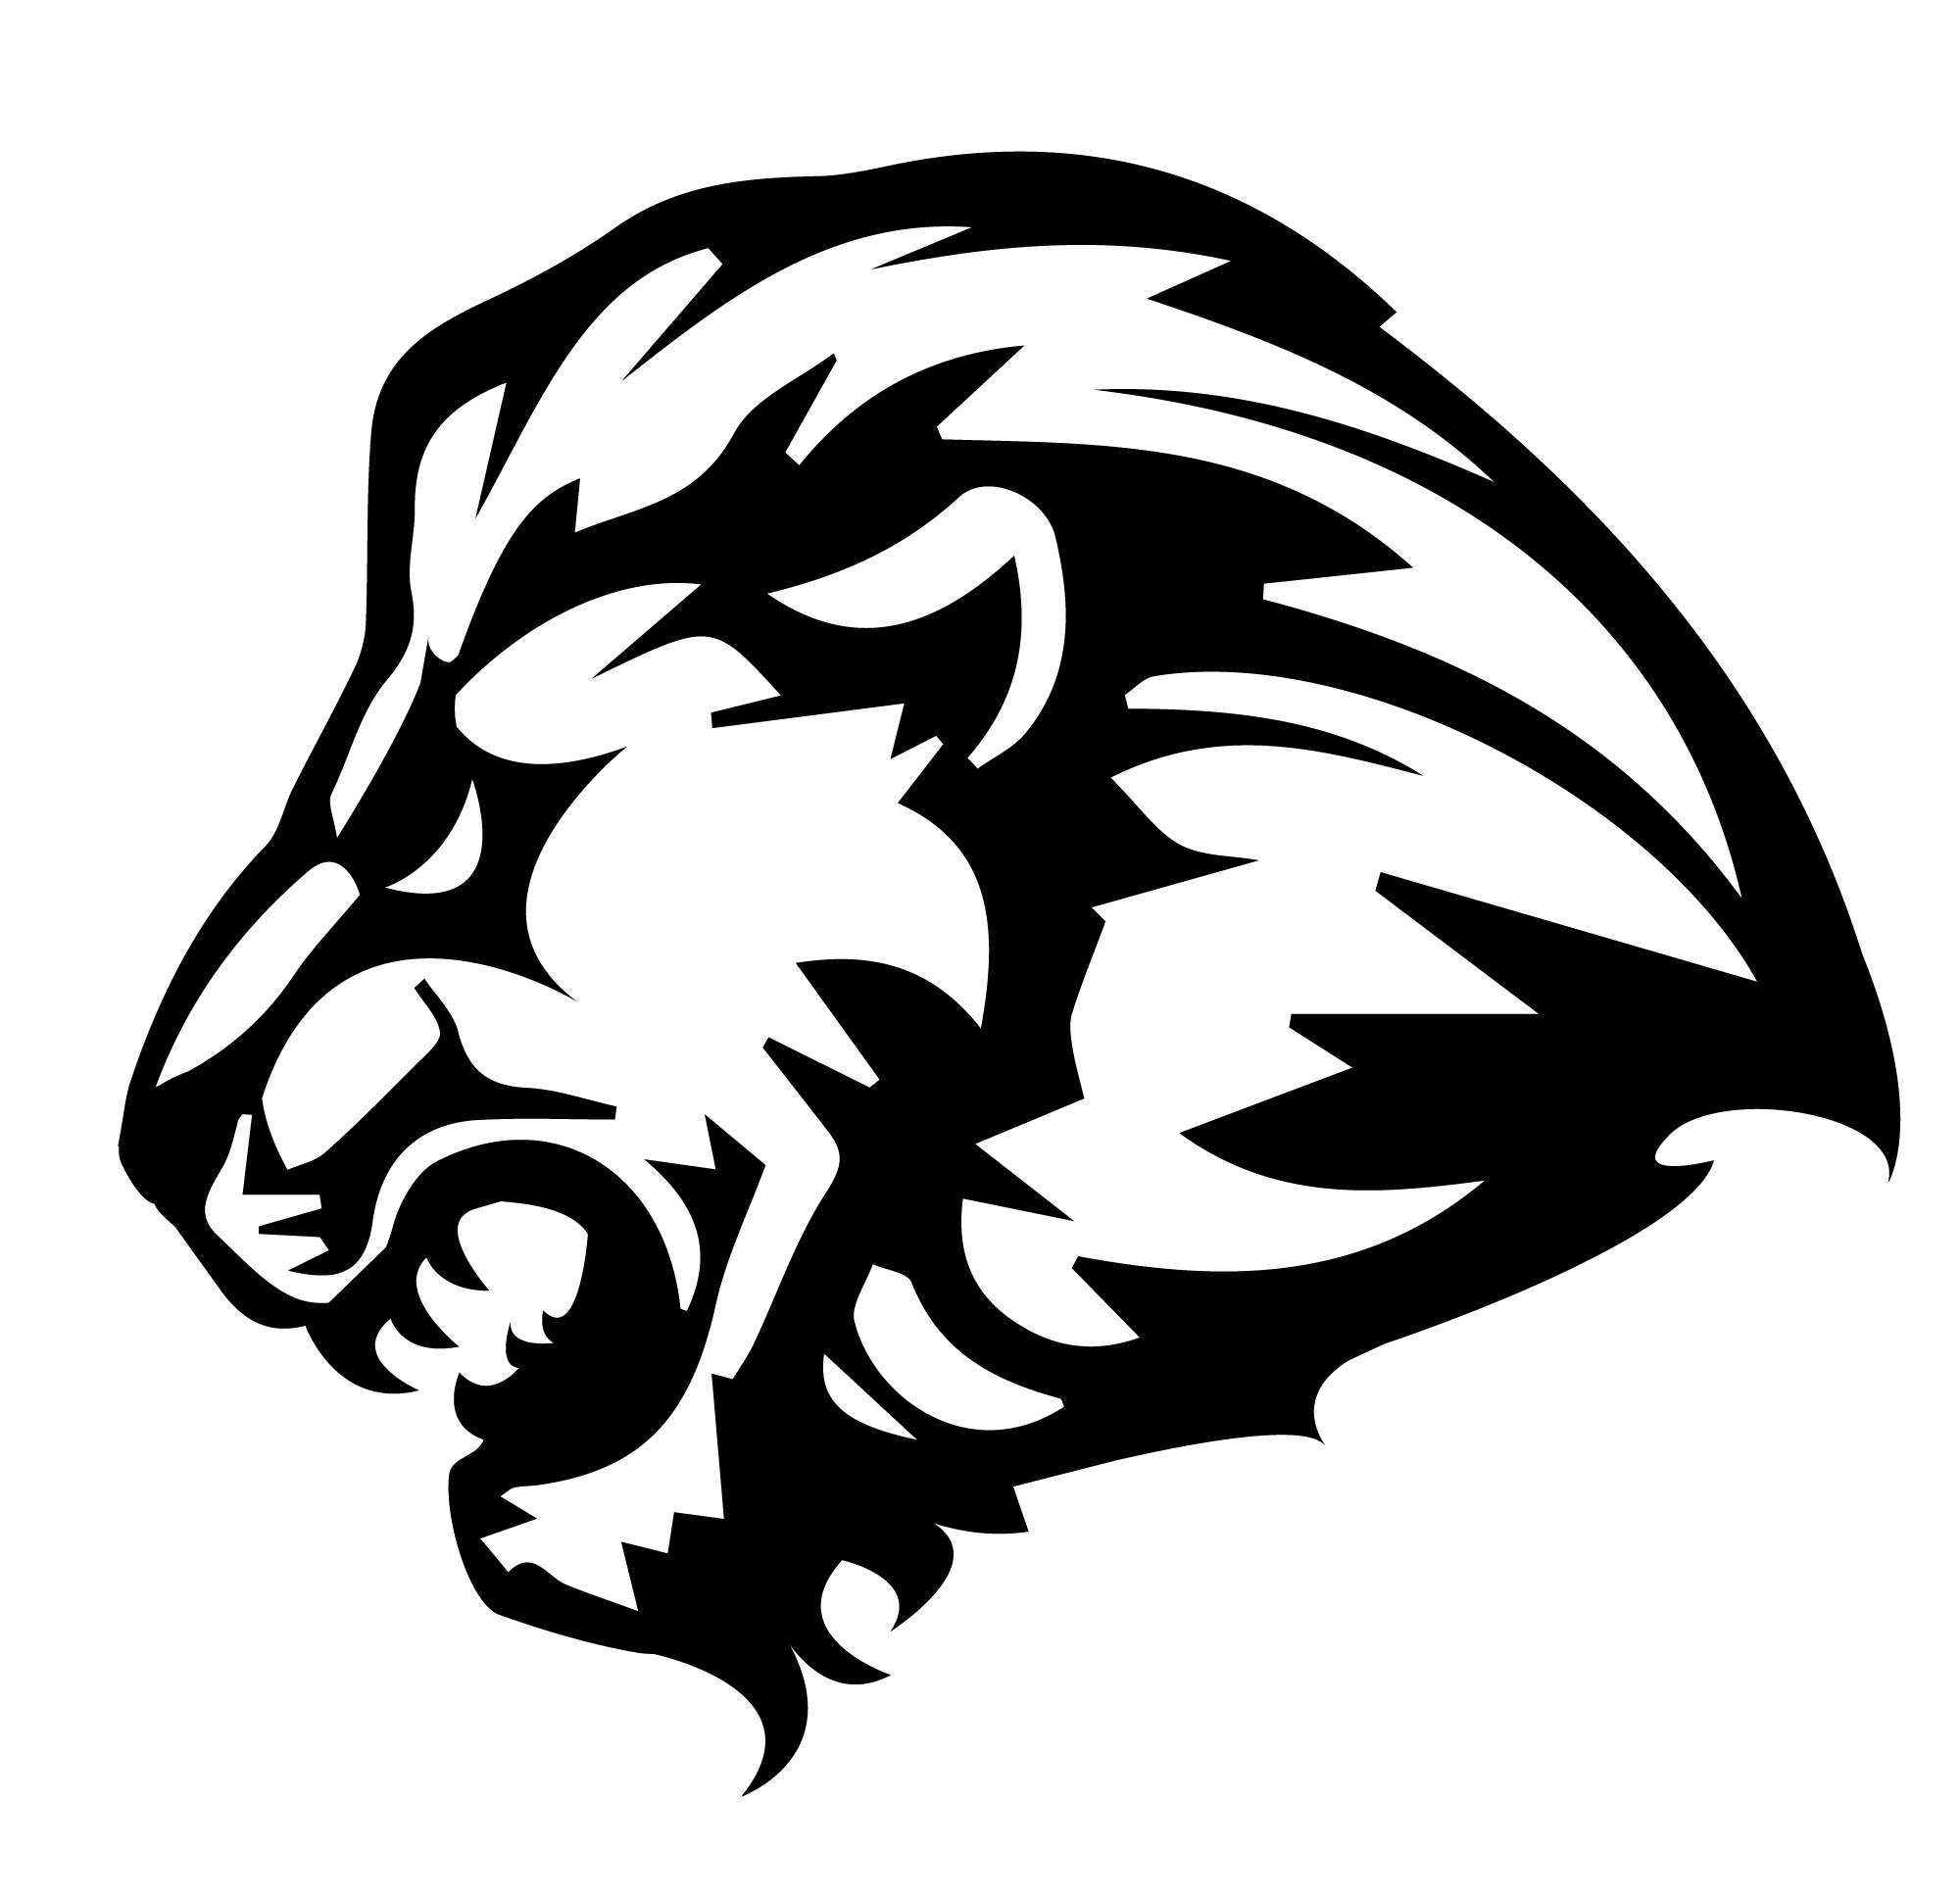 2000x1939 Png Lion Head Roaring Transparent Lion Head Roaring.png Images